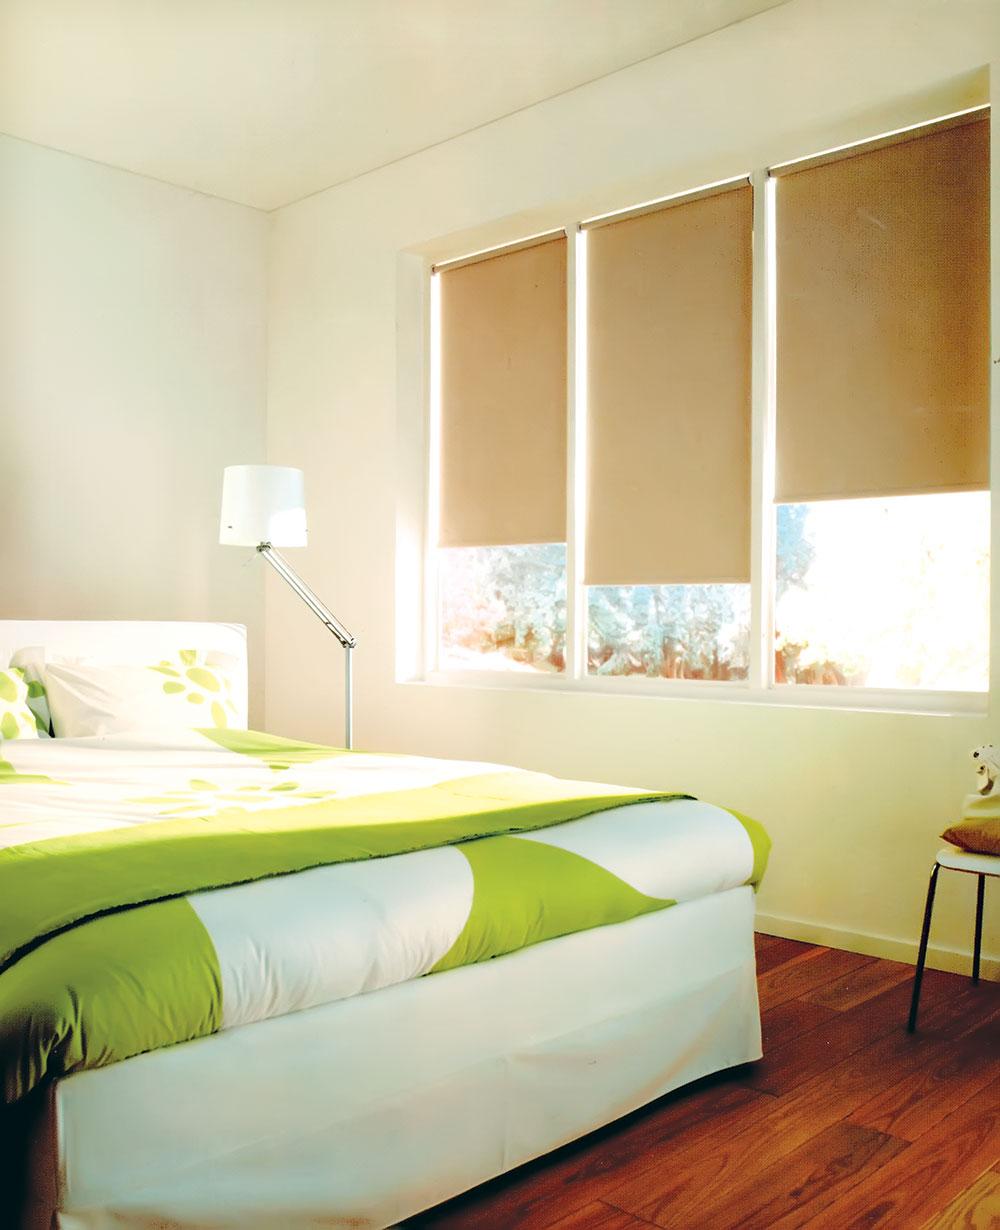 Rolo zavese, panelne zavese ili zebra rolo zavese